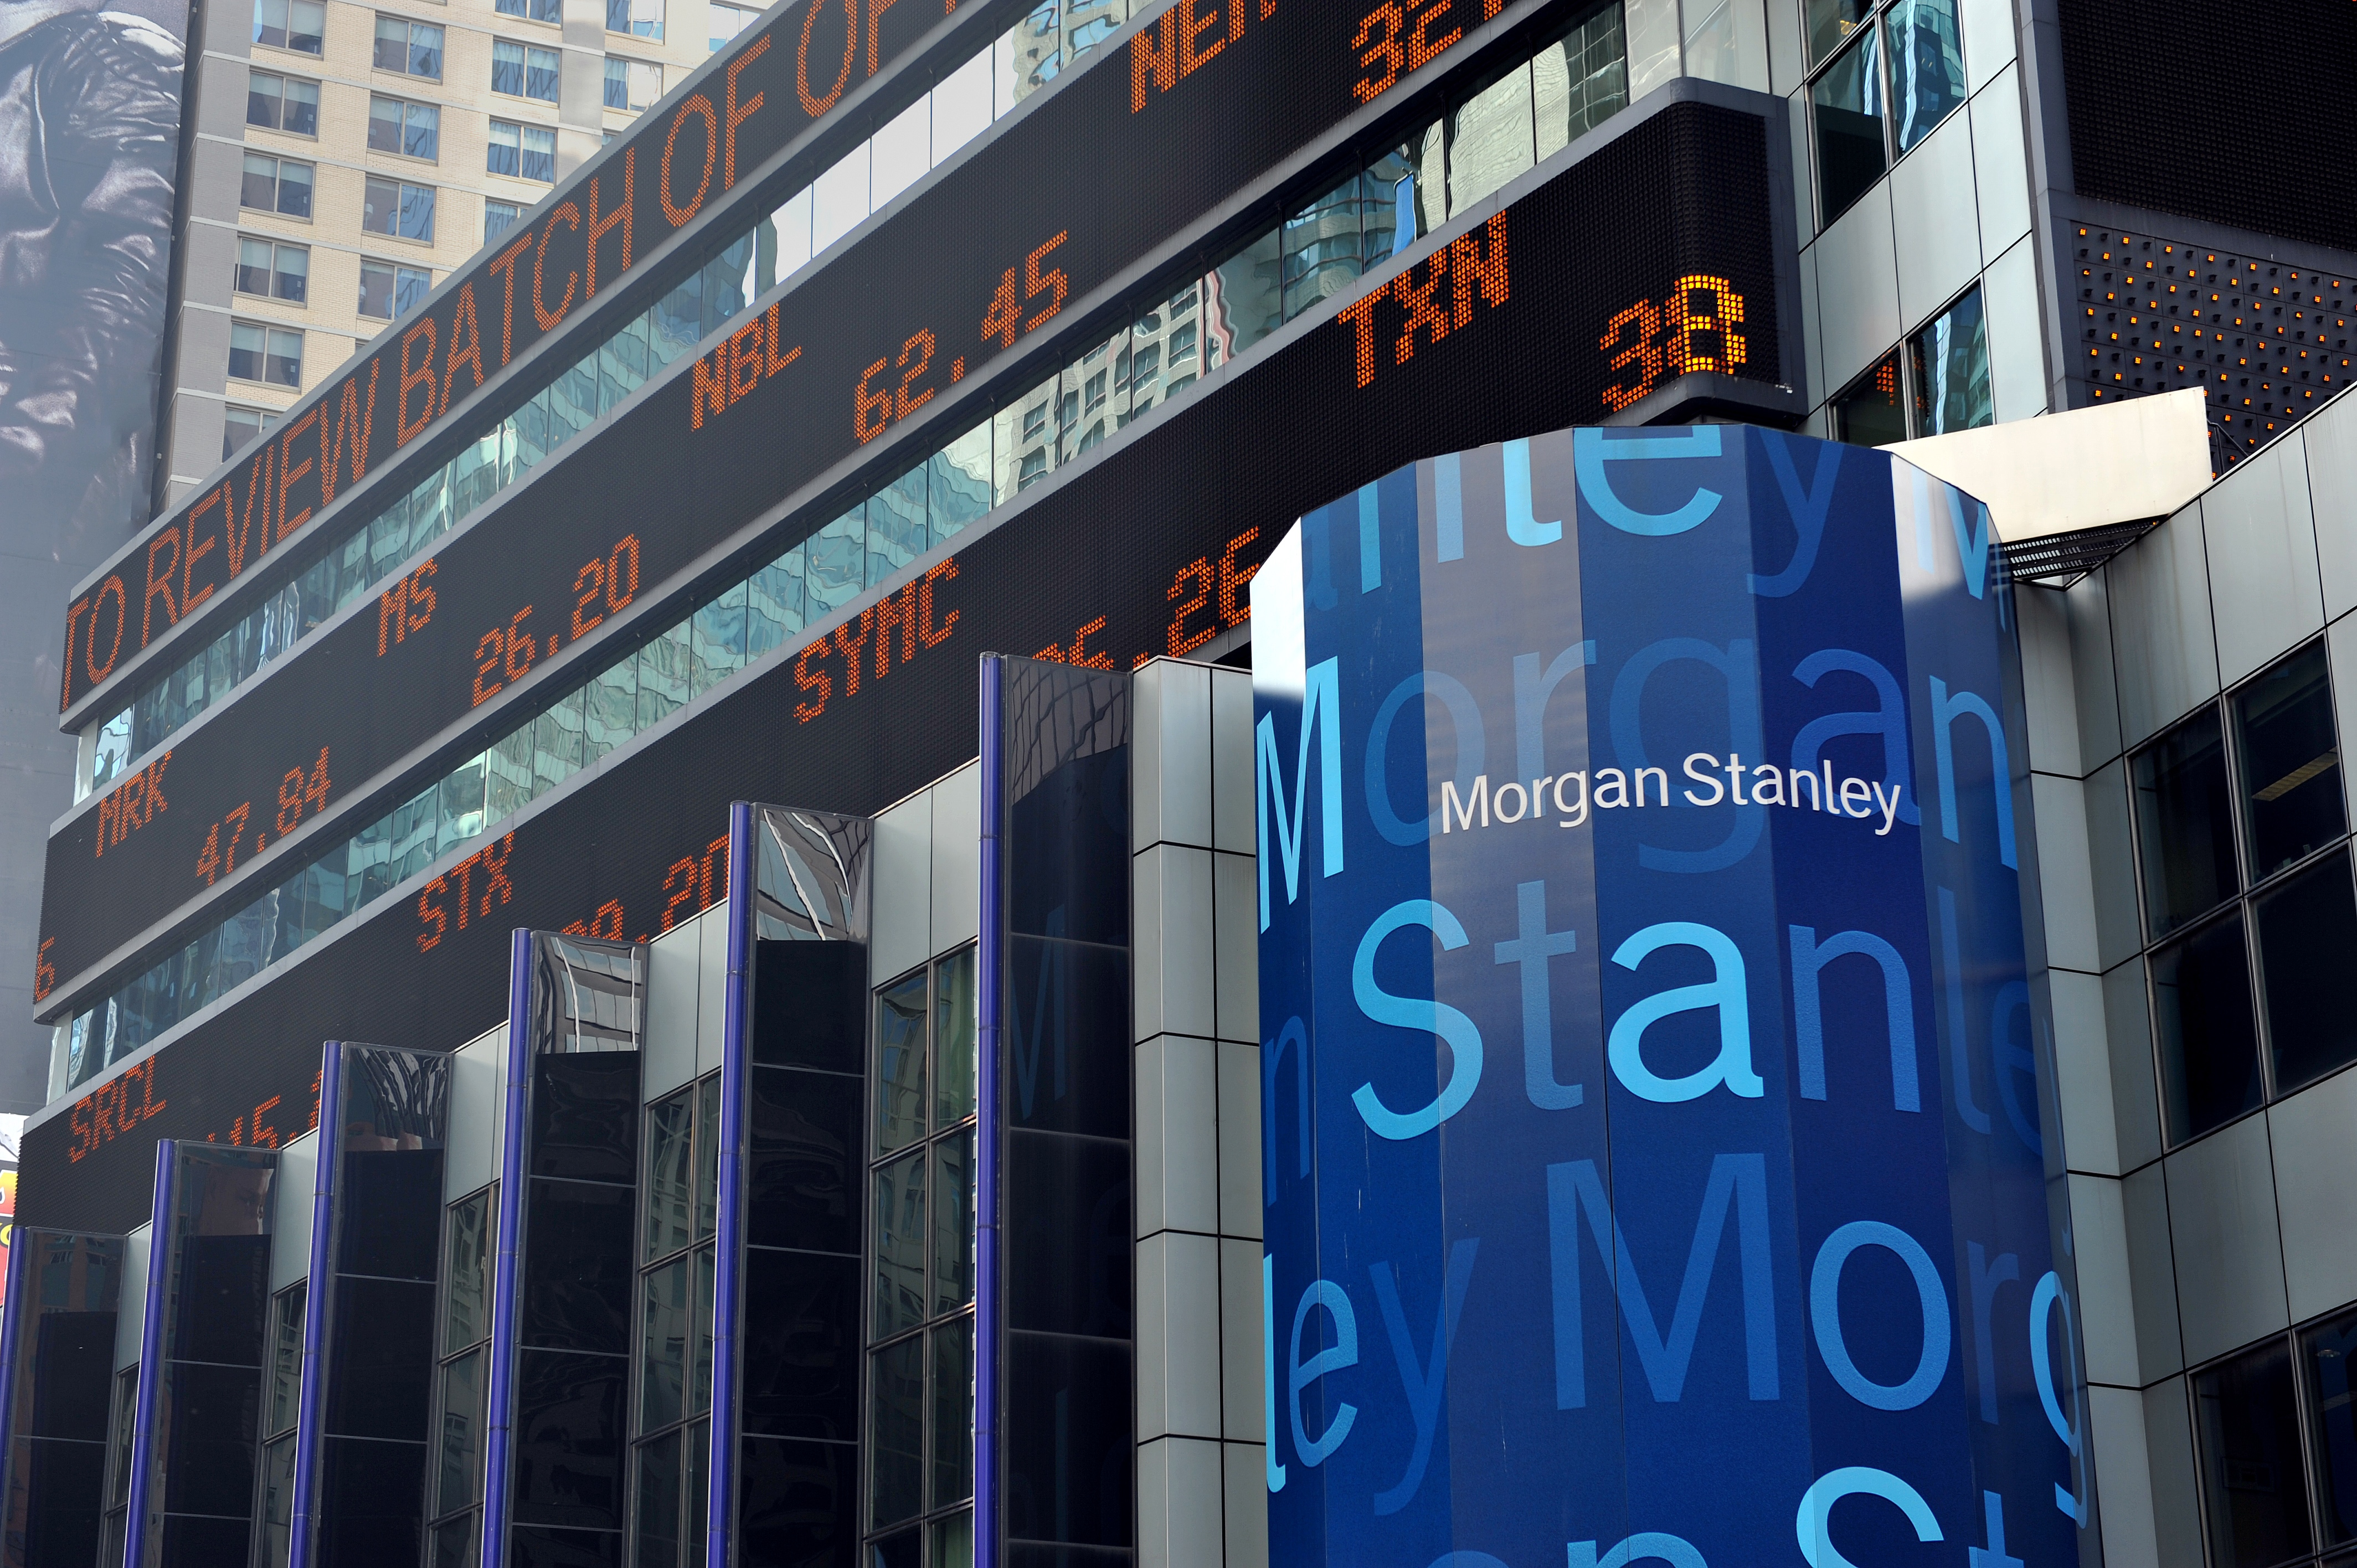 Morgan Stanley headquarters in New York City.